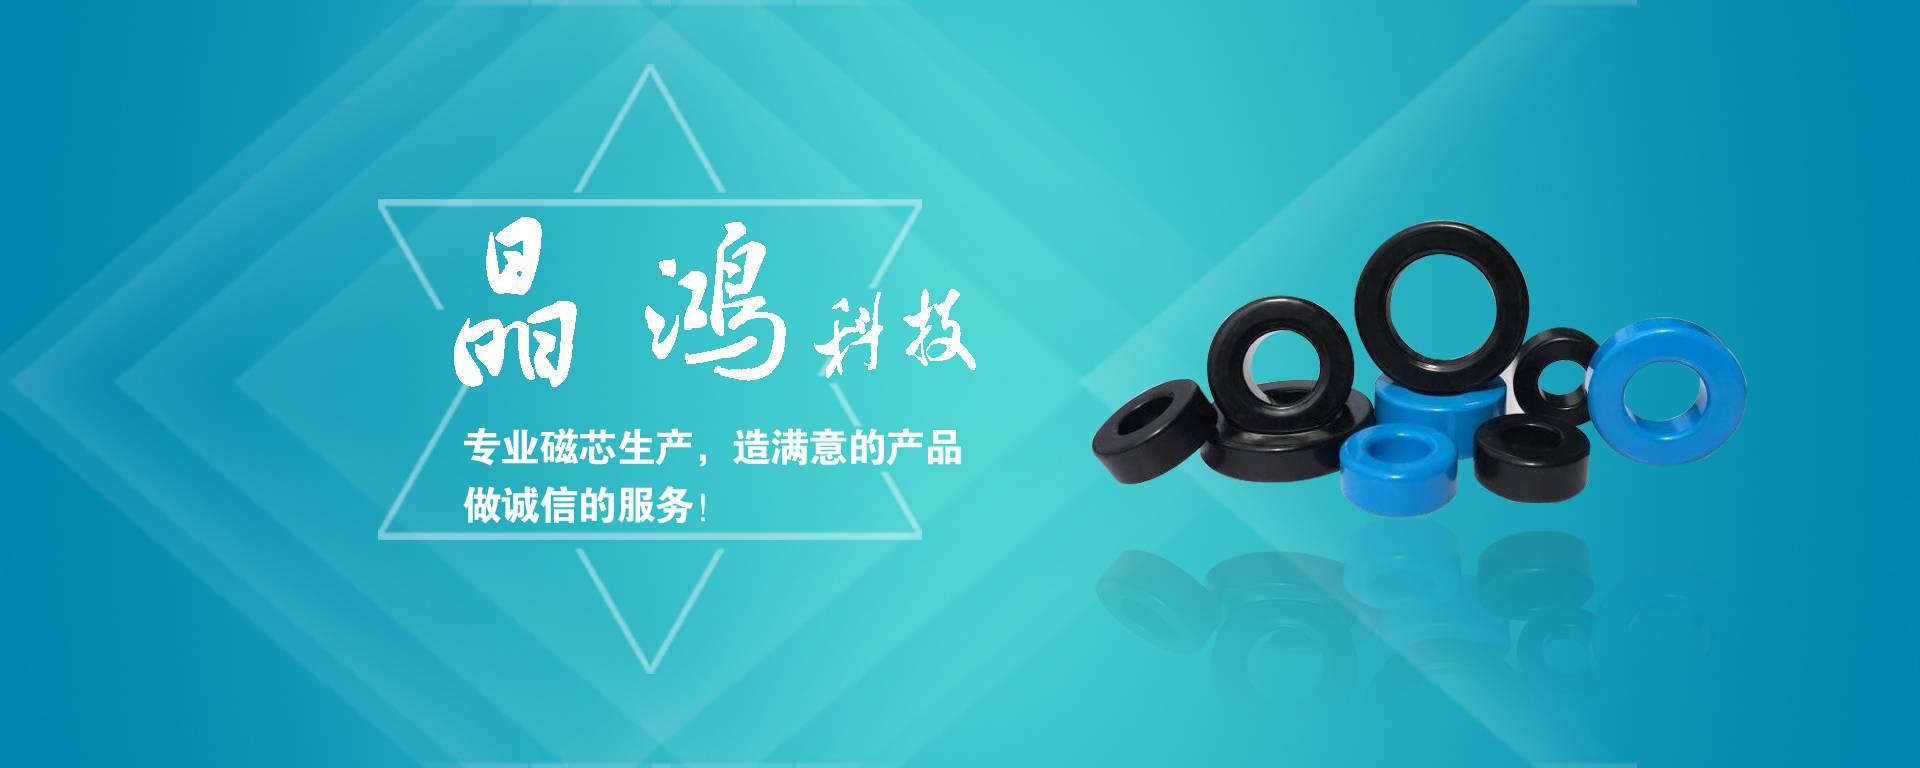 ld乐动体育网址_乐动体育app下载y_乐动投注平台